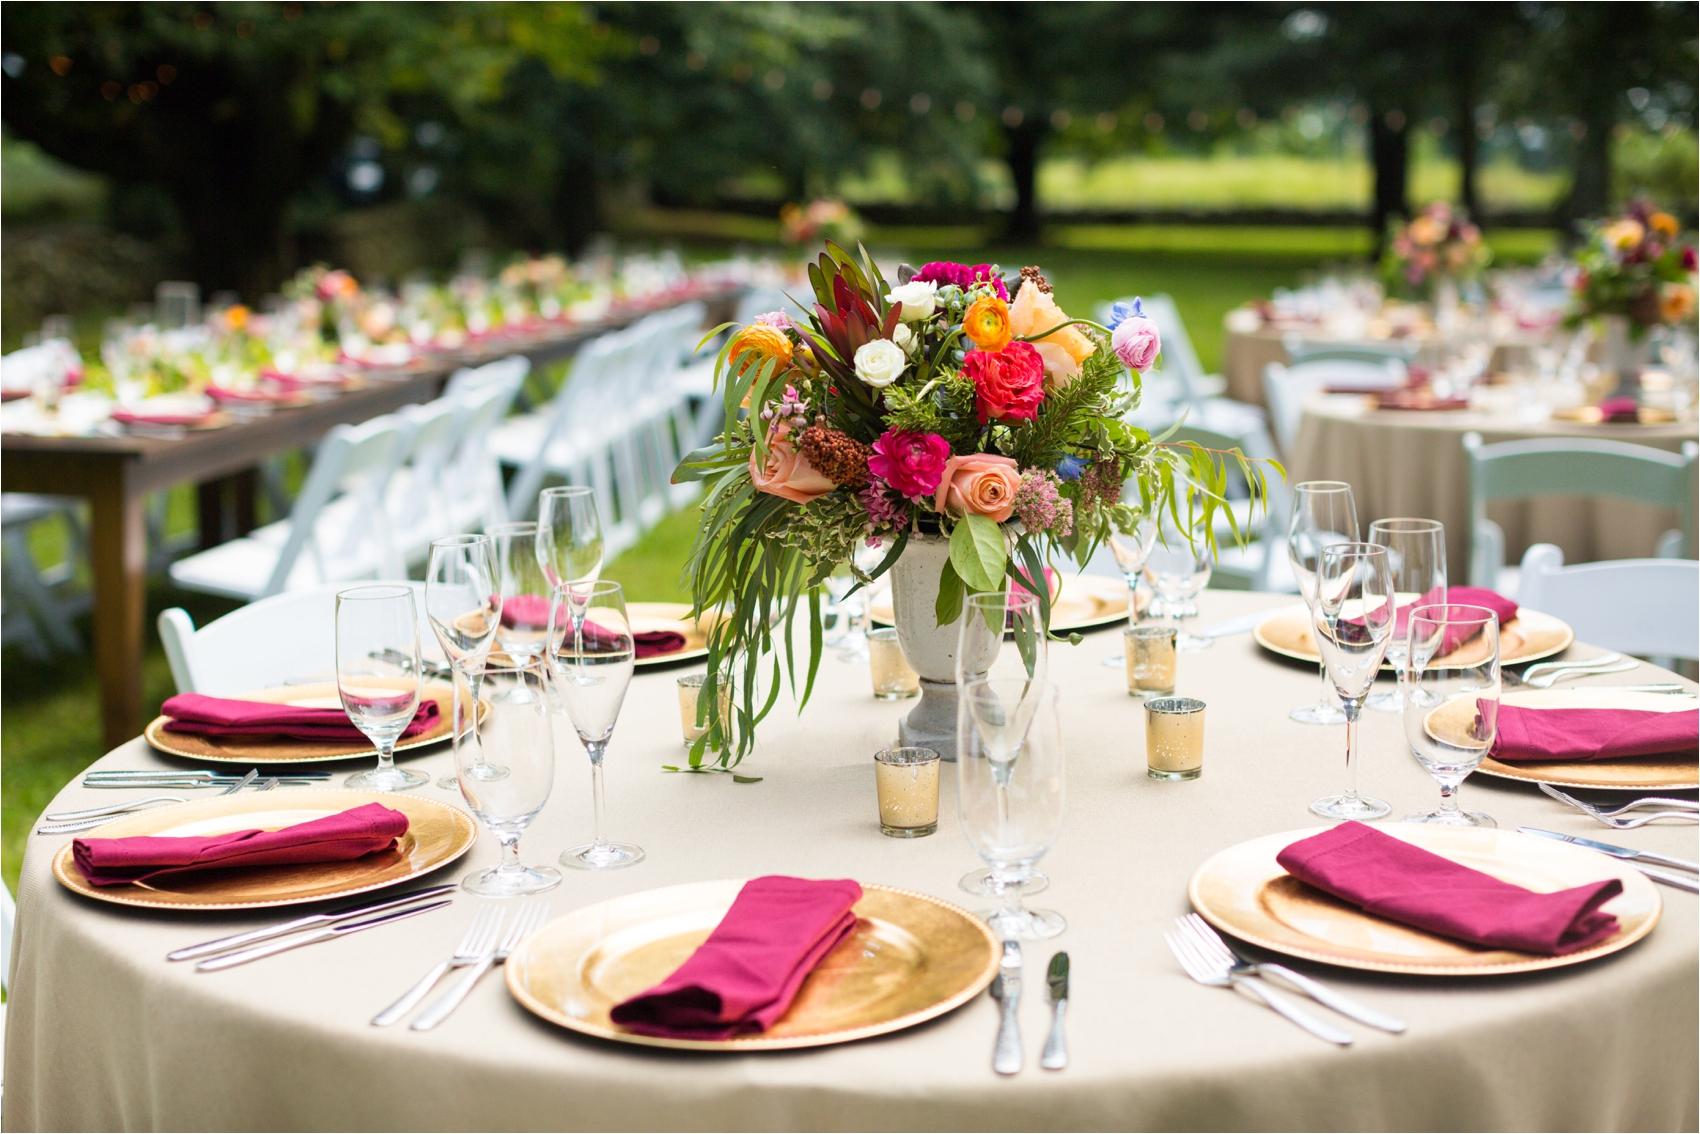 Feather-and-Oak-Rainforest-Trust-Virginia-Wedding-0298.jpg